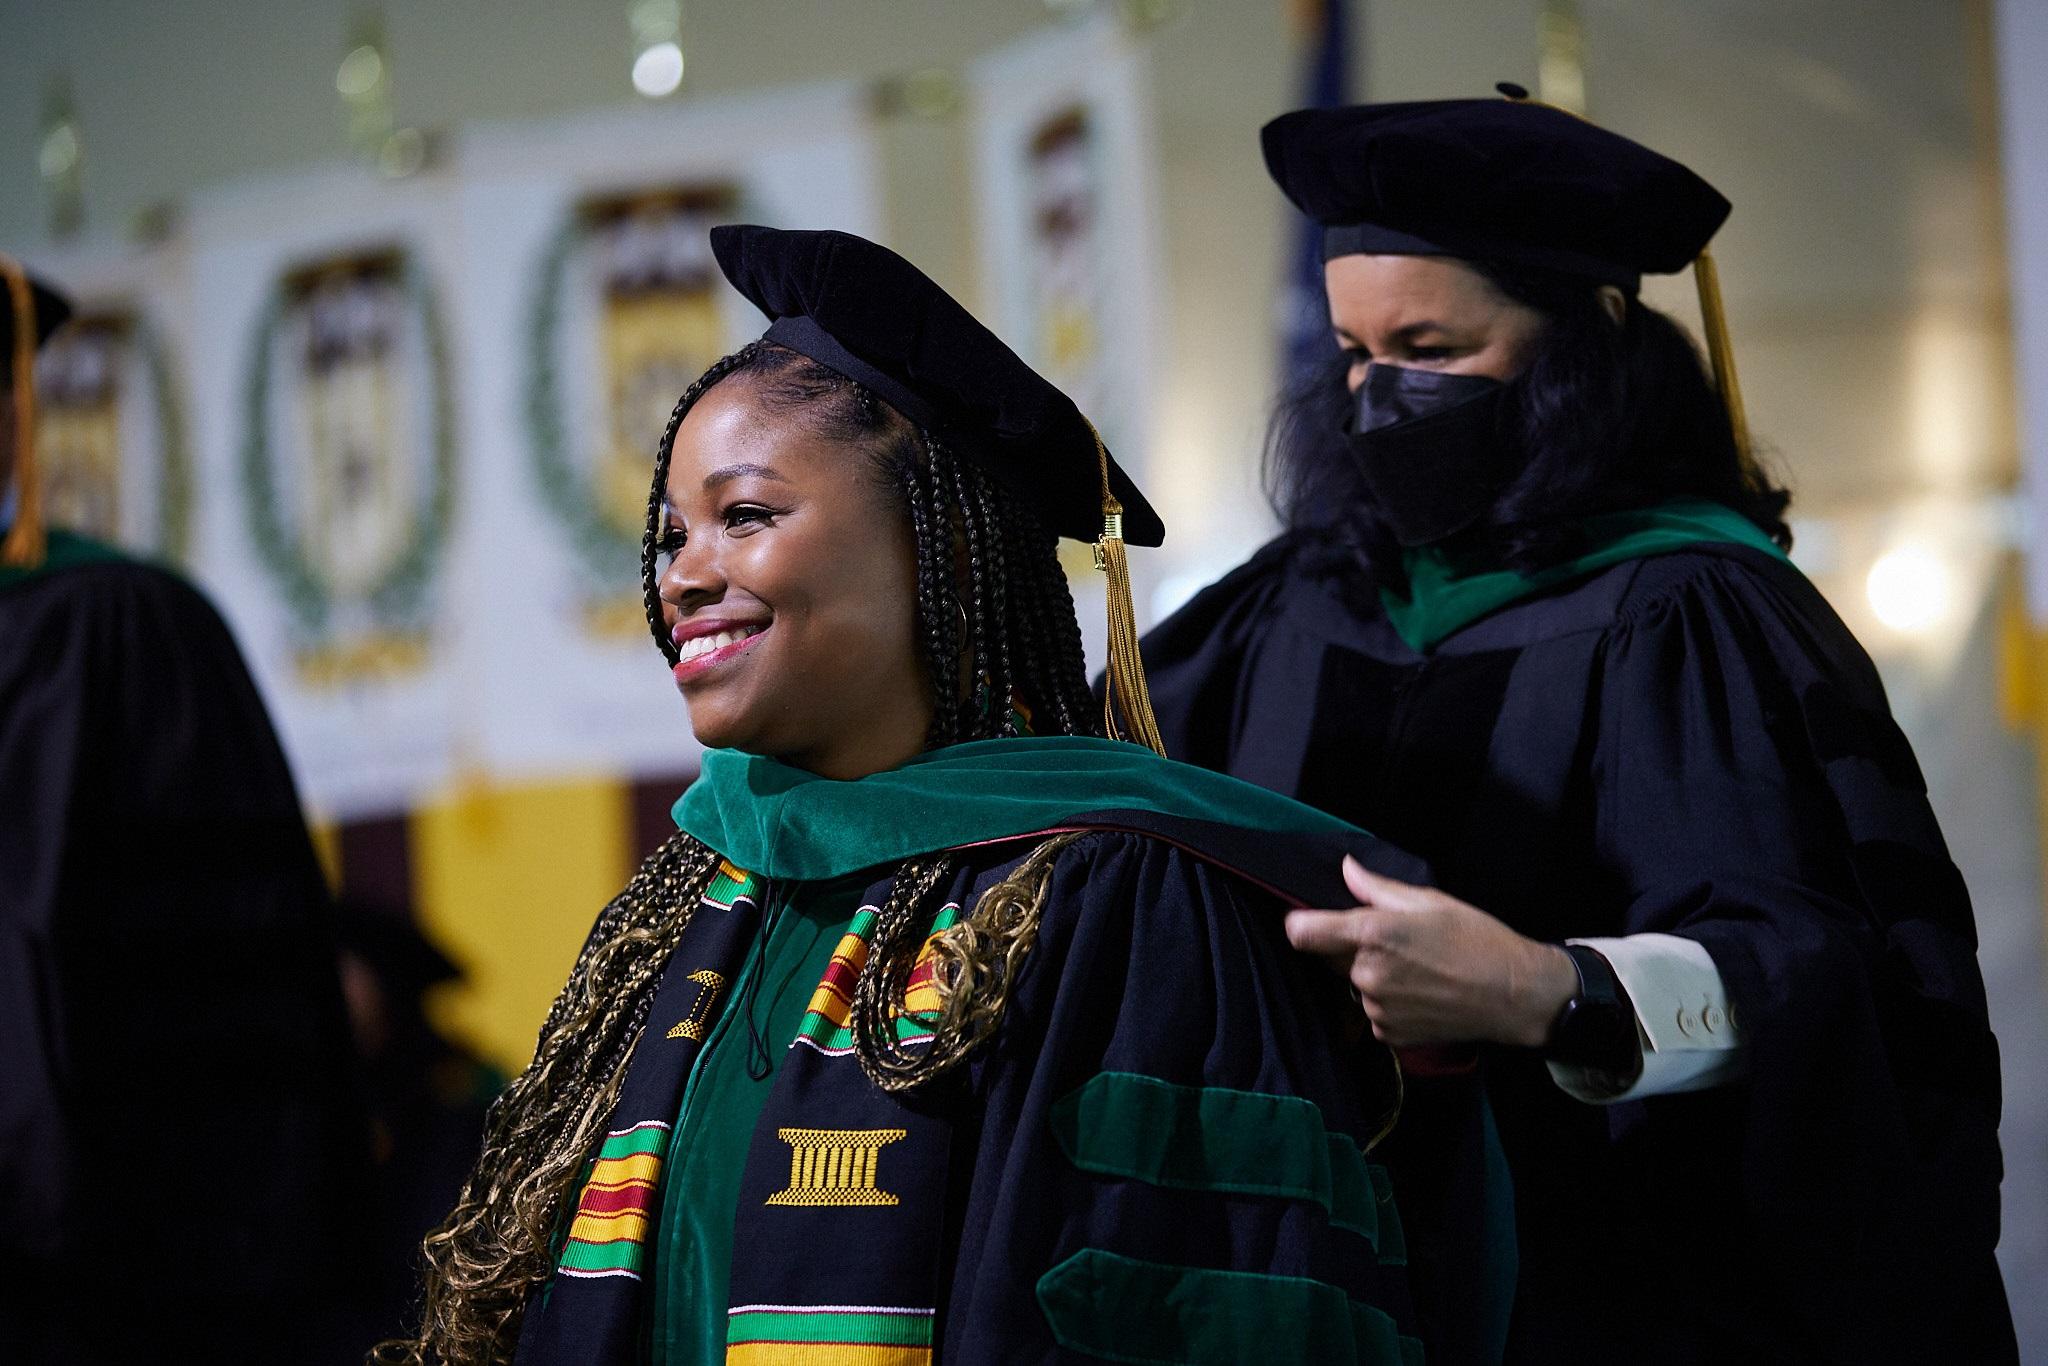 CMSRU graduate receives ceremonial hood